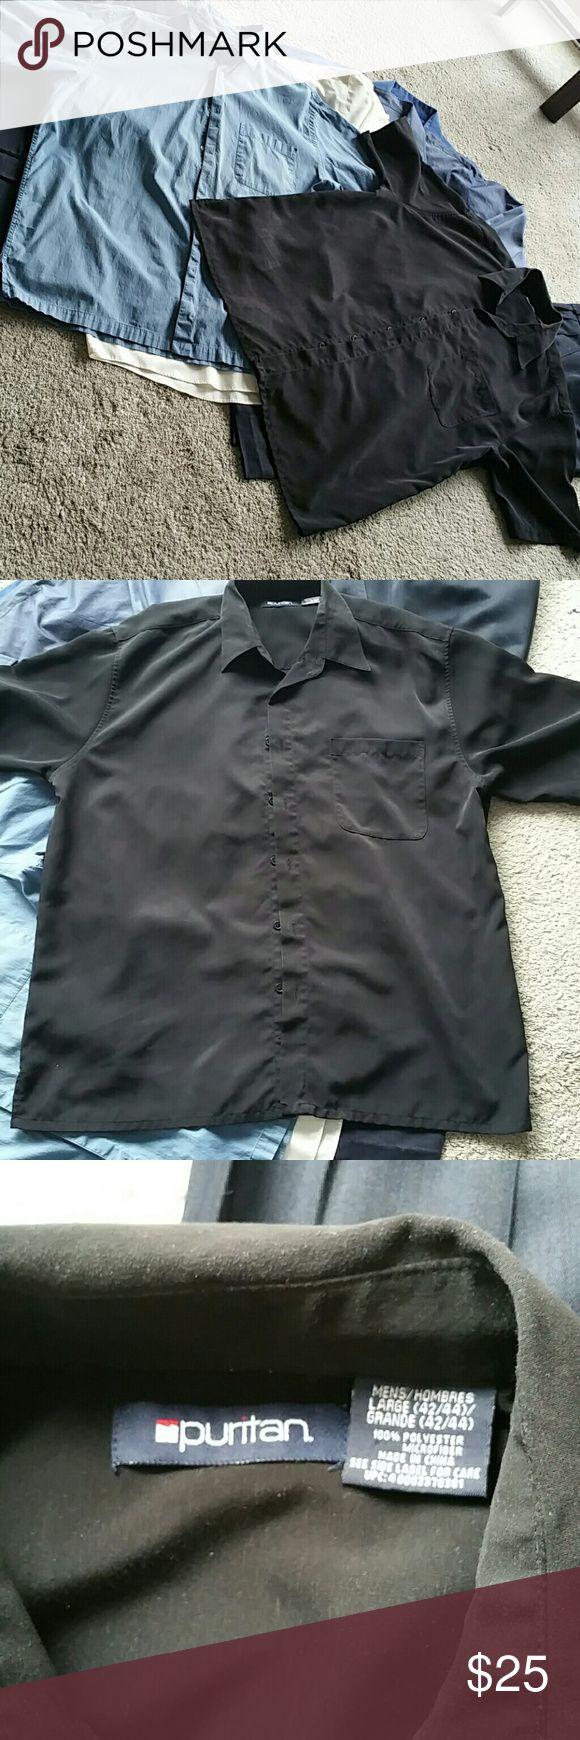 2 for 1 Special! Men's Short Sleeved Dress Shirts 1. Black Satin Finish,  Single Front Pocket,   Brand: Puritan Size LG 43/44 2. Blue/Grey Ribbed Cotton Finish, Single Front Pocket,  Brand: Arrow  Size: Large Puritan Shirts Dress Shirts